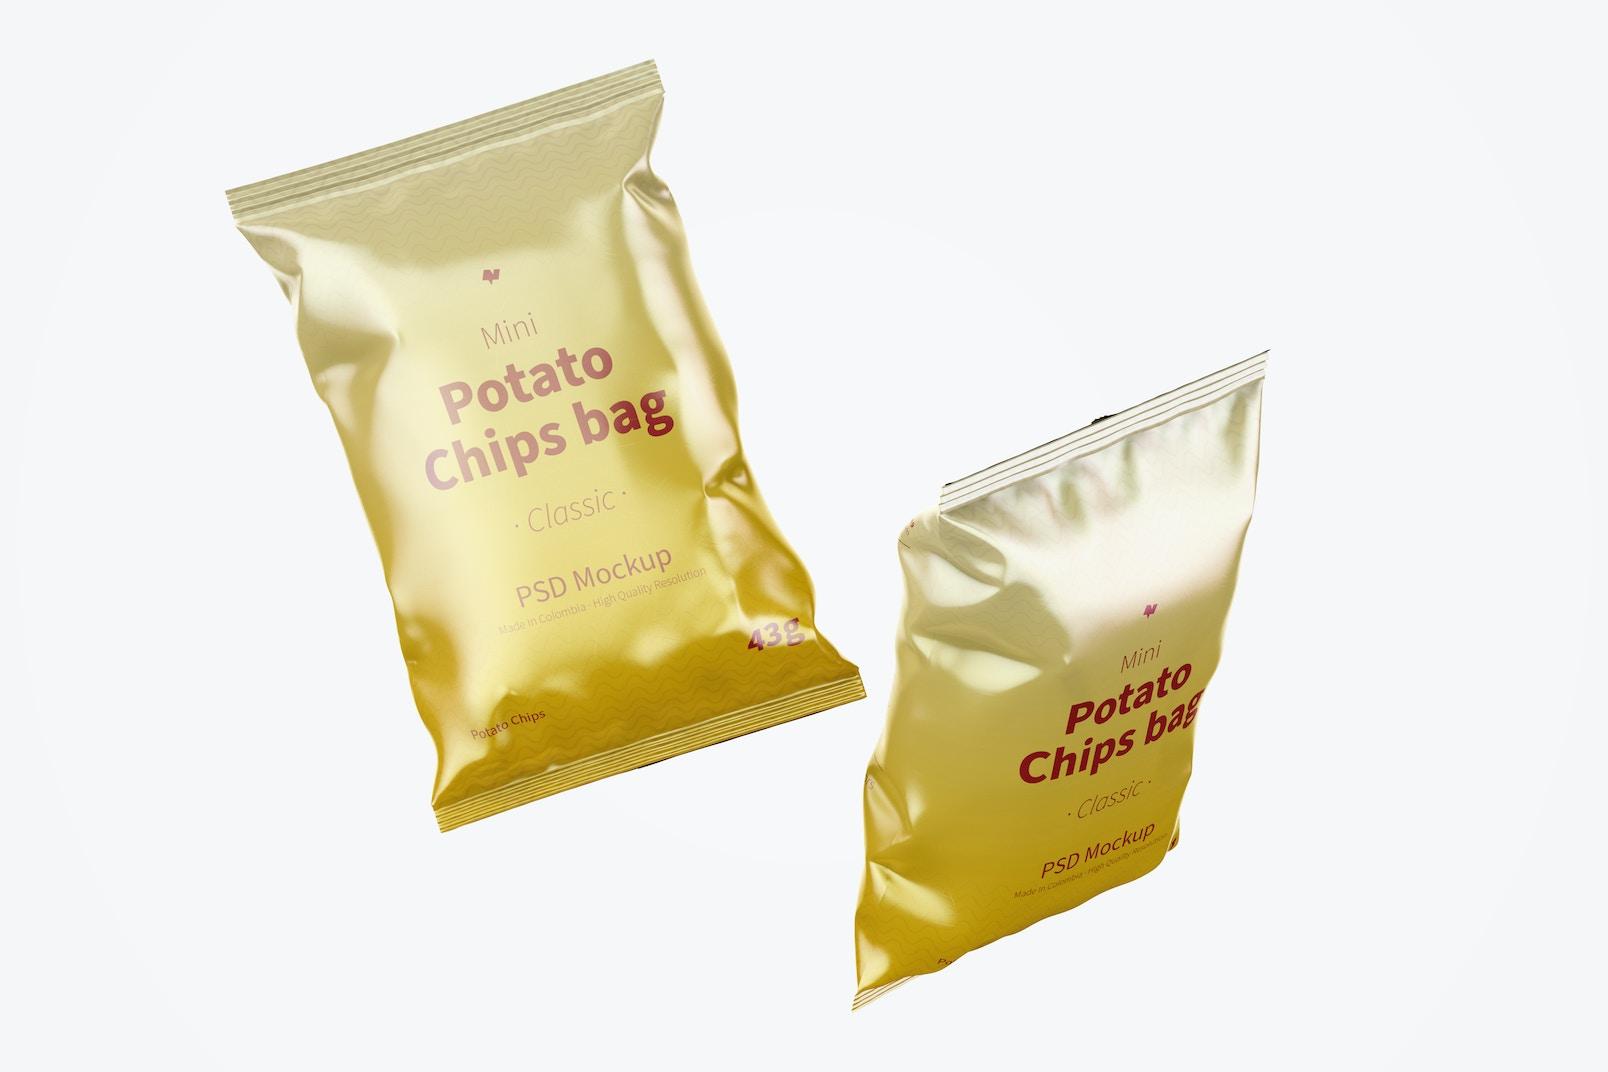 Glossy Mini Potato Bags Mockup, Floating